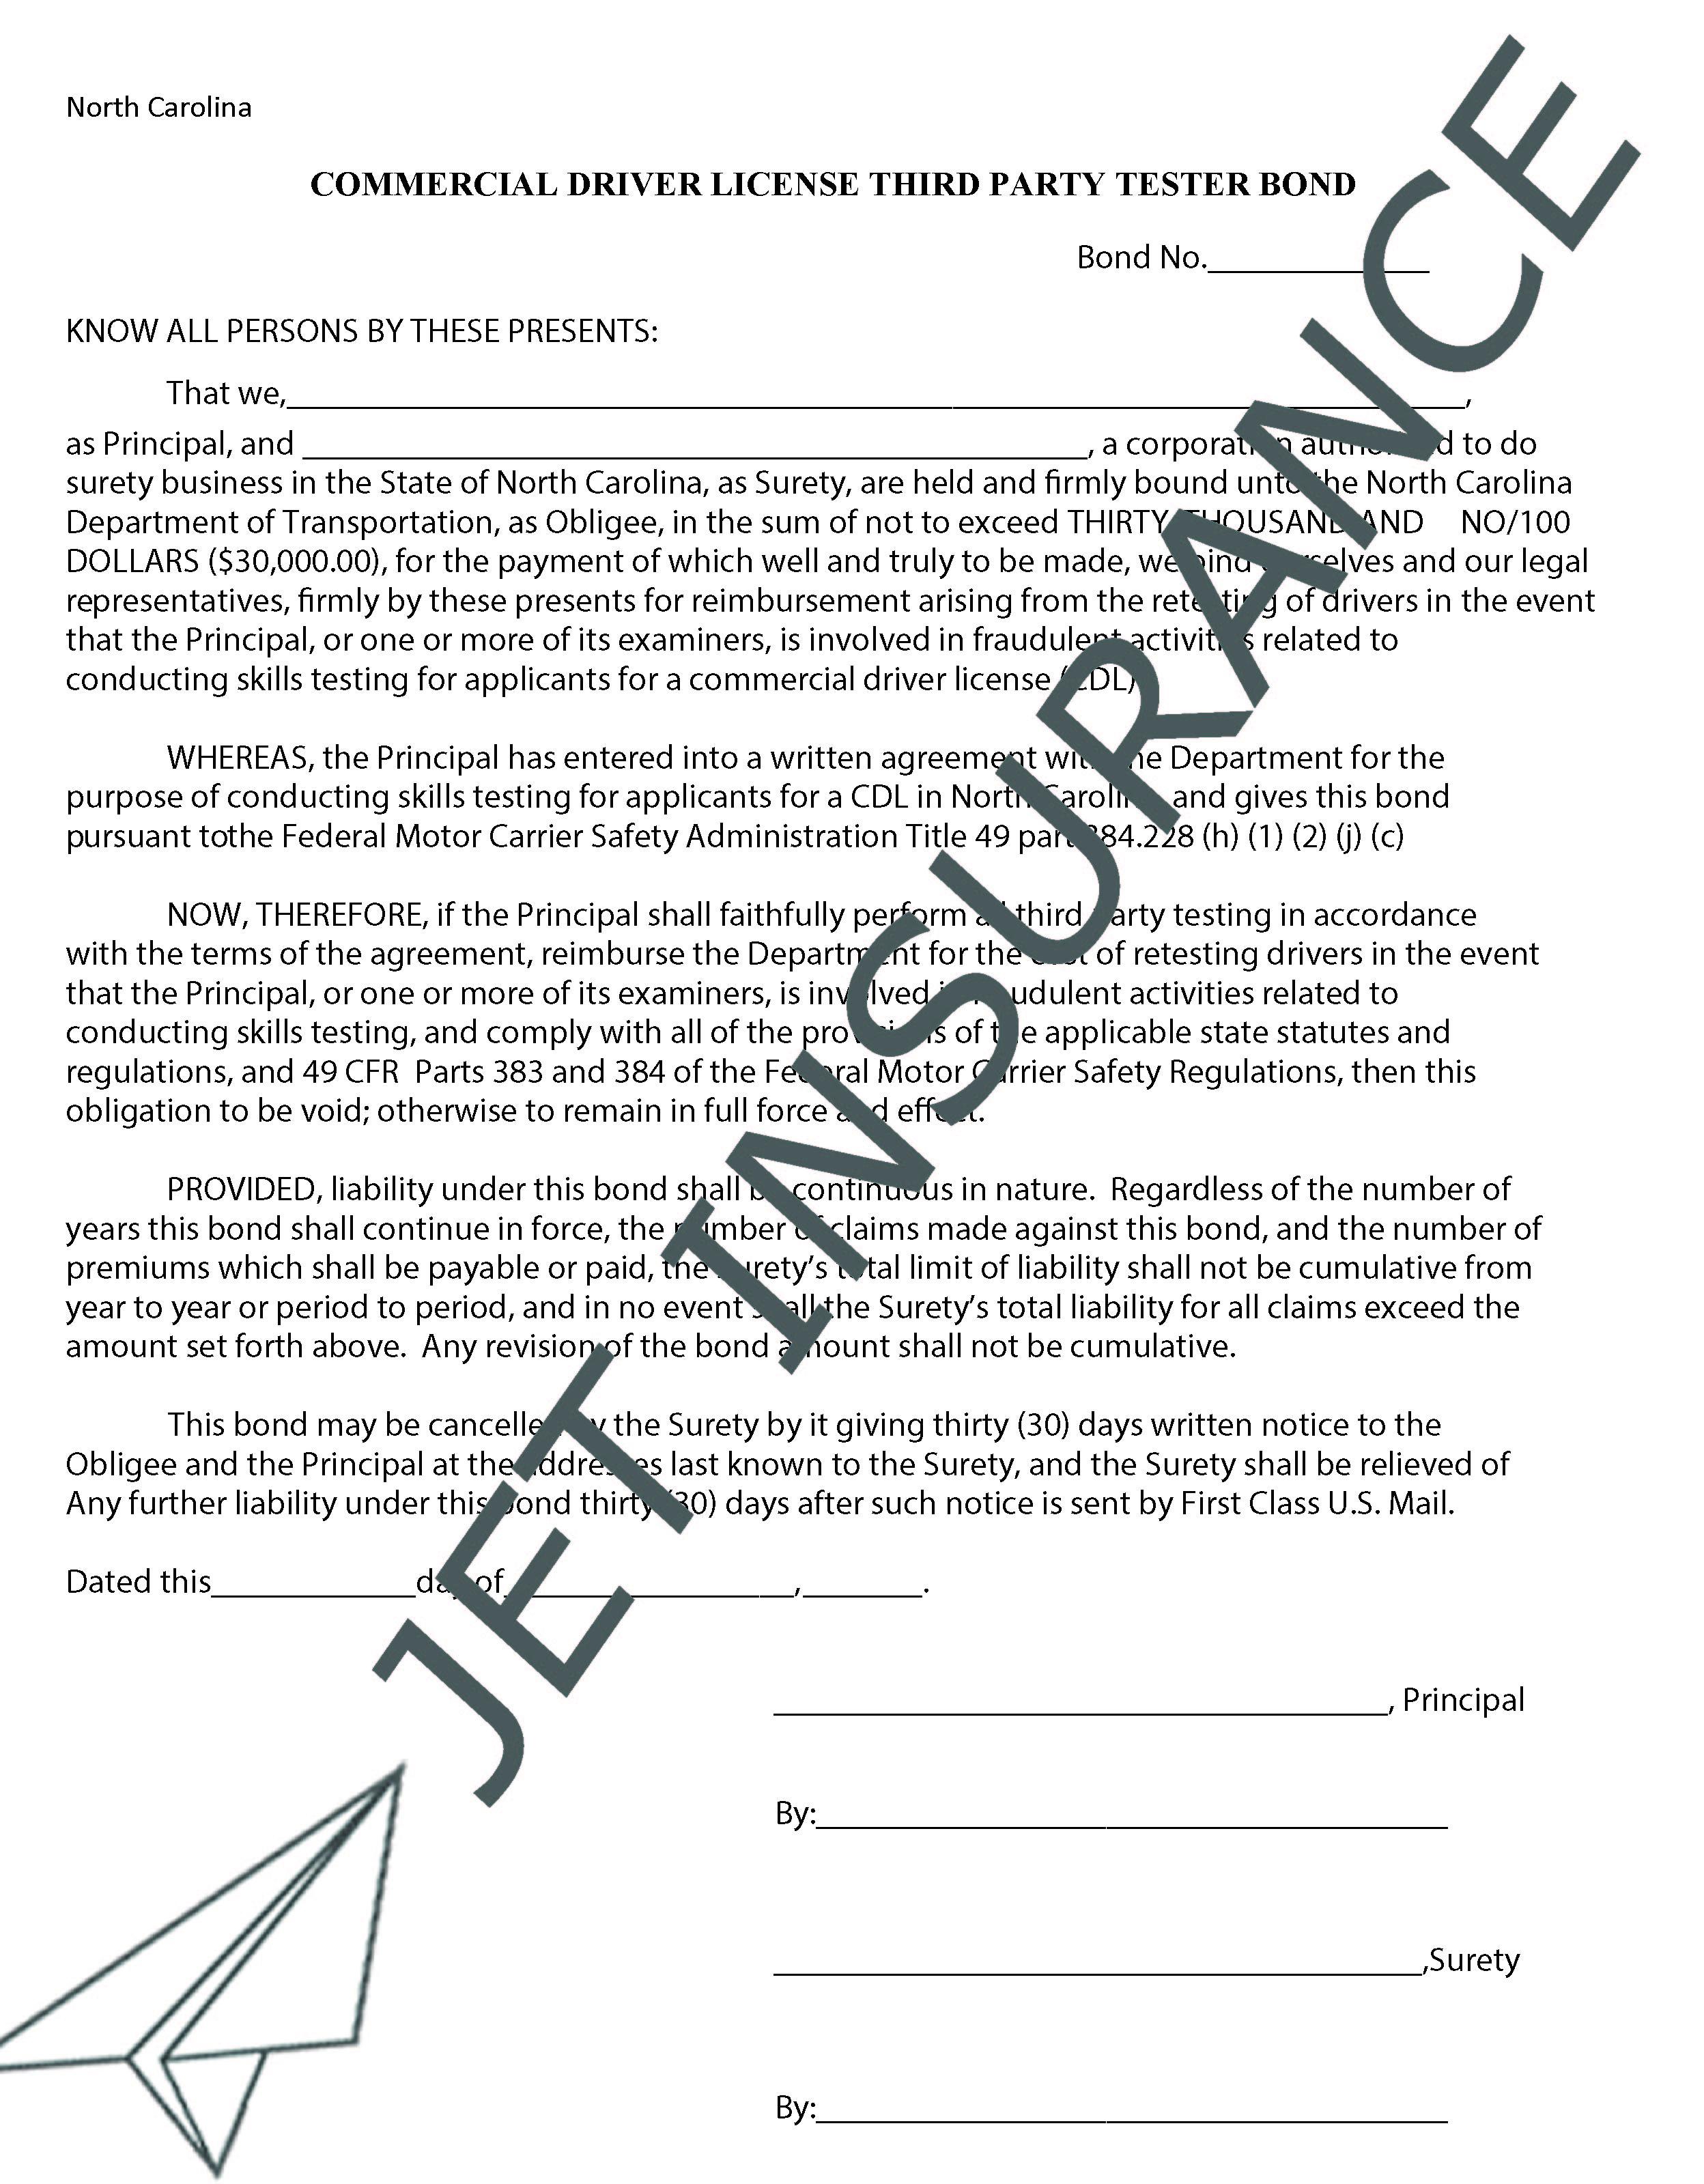 North Carolina Third Party CDL Testing Bond Form